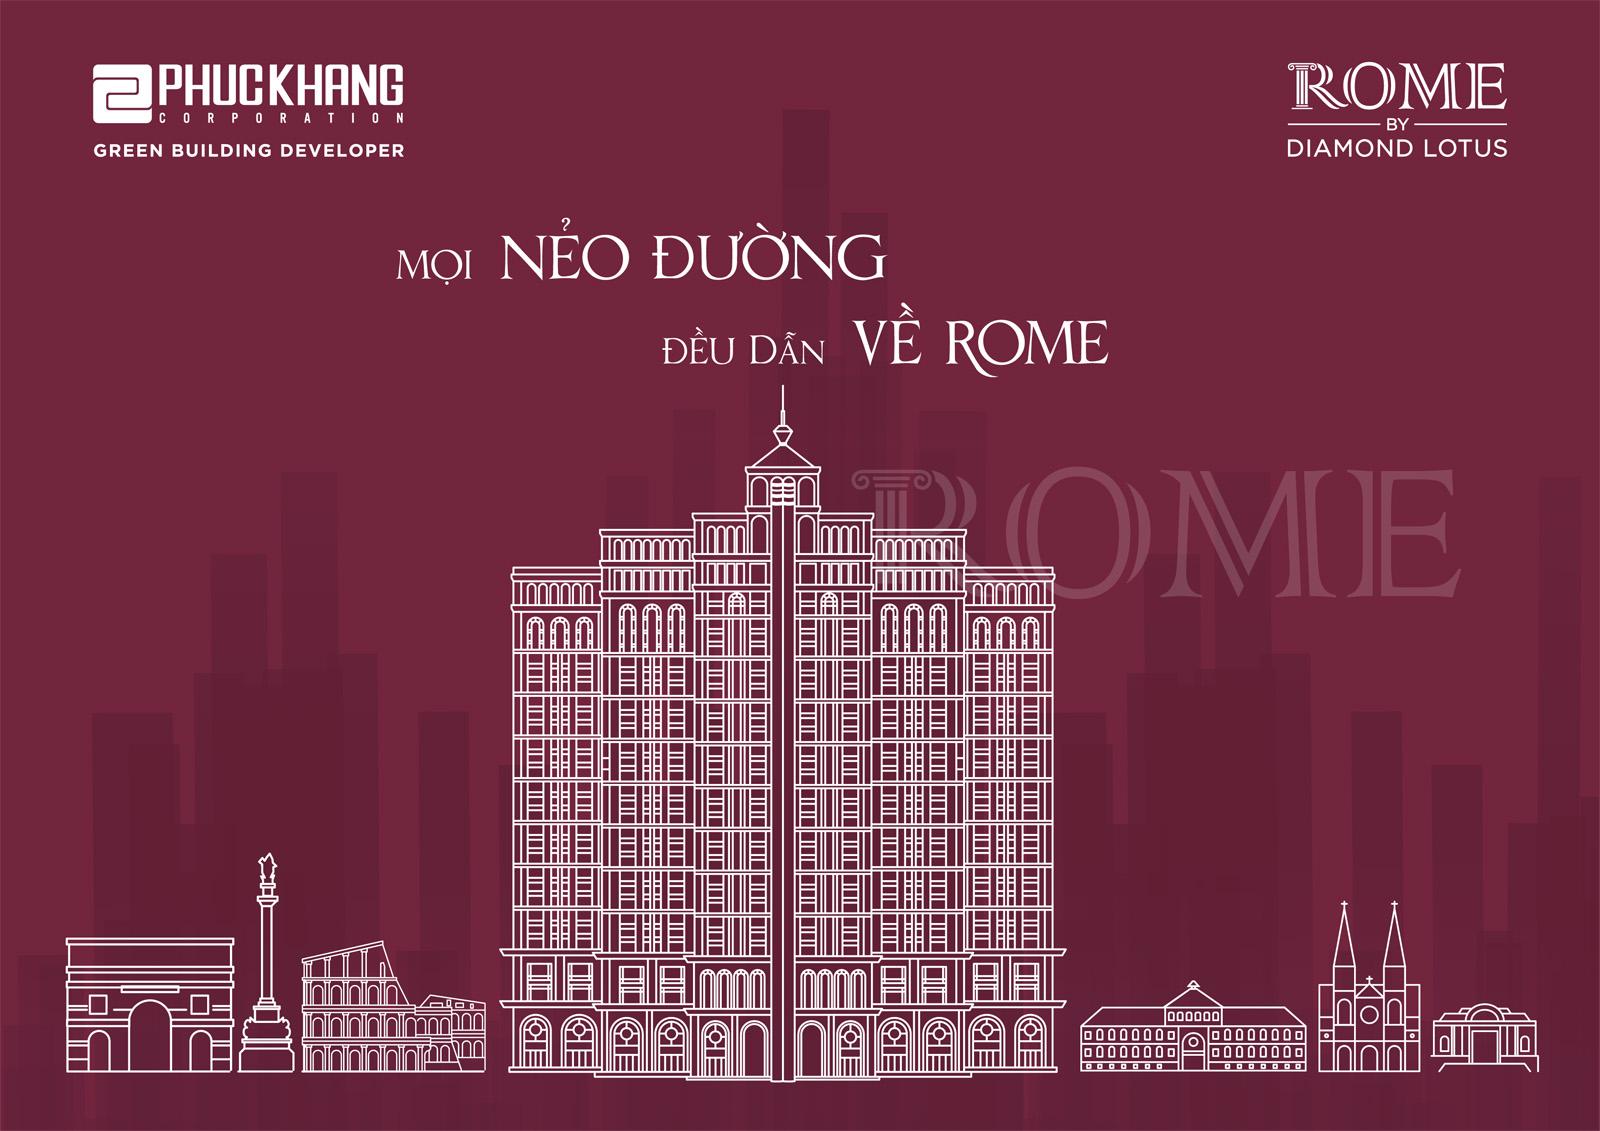 Mặt bằng dự án ROME DIAMOND LOTUS